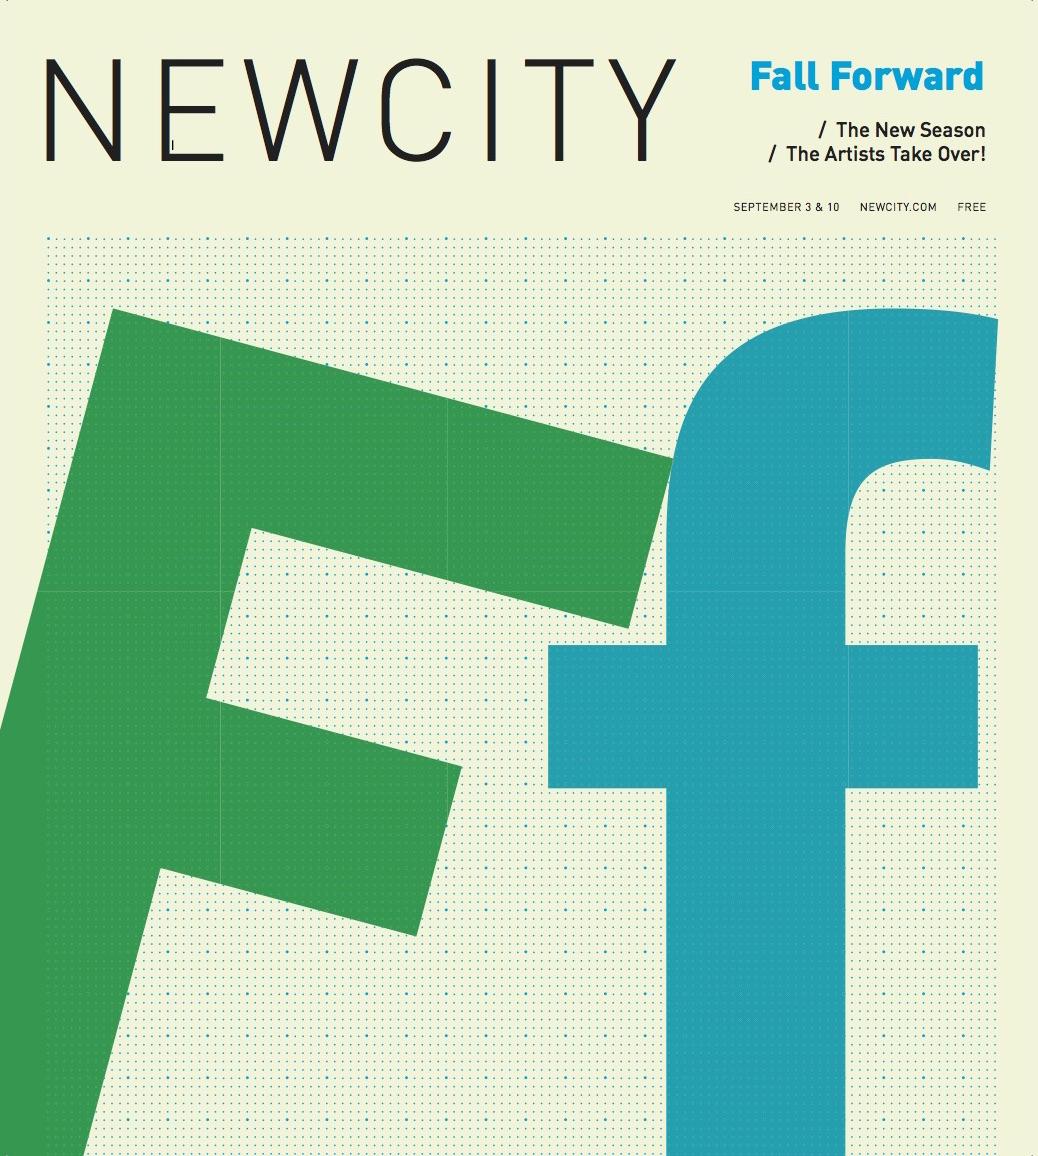 Newcity_FallForward_2015